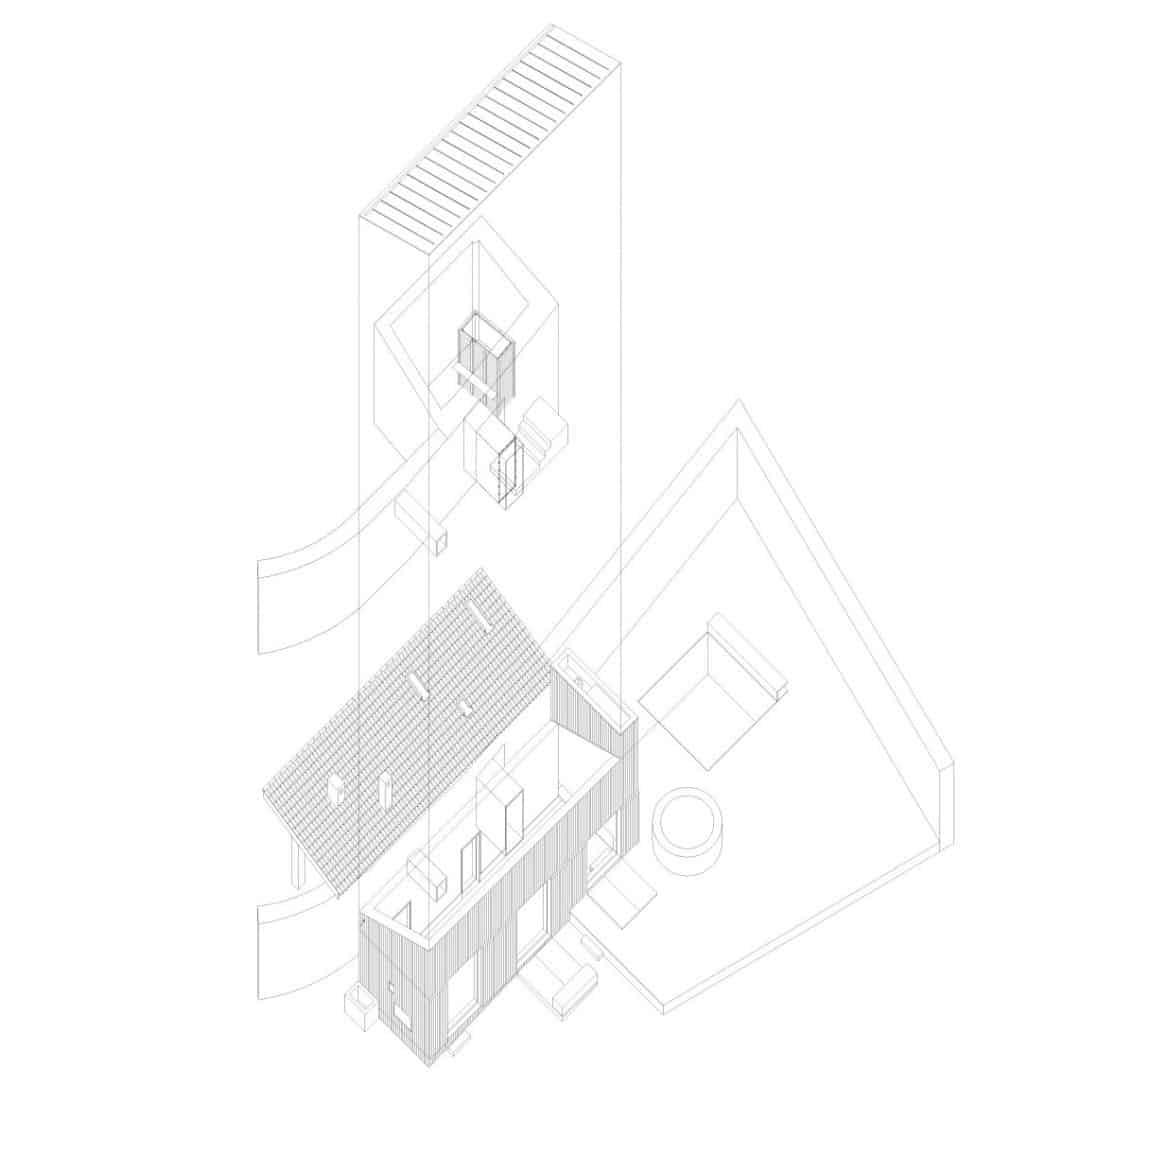 House in Chamusca Da Beira by João Mendes Ribeiro (36)